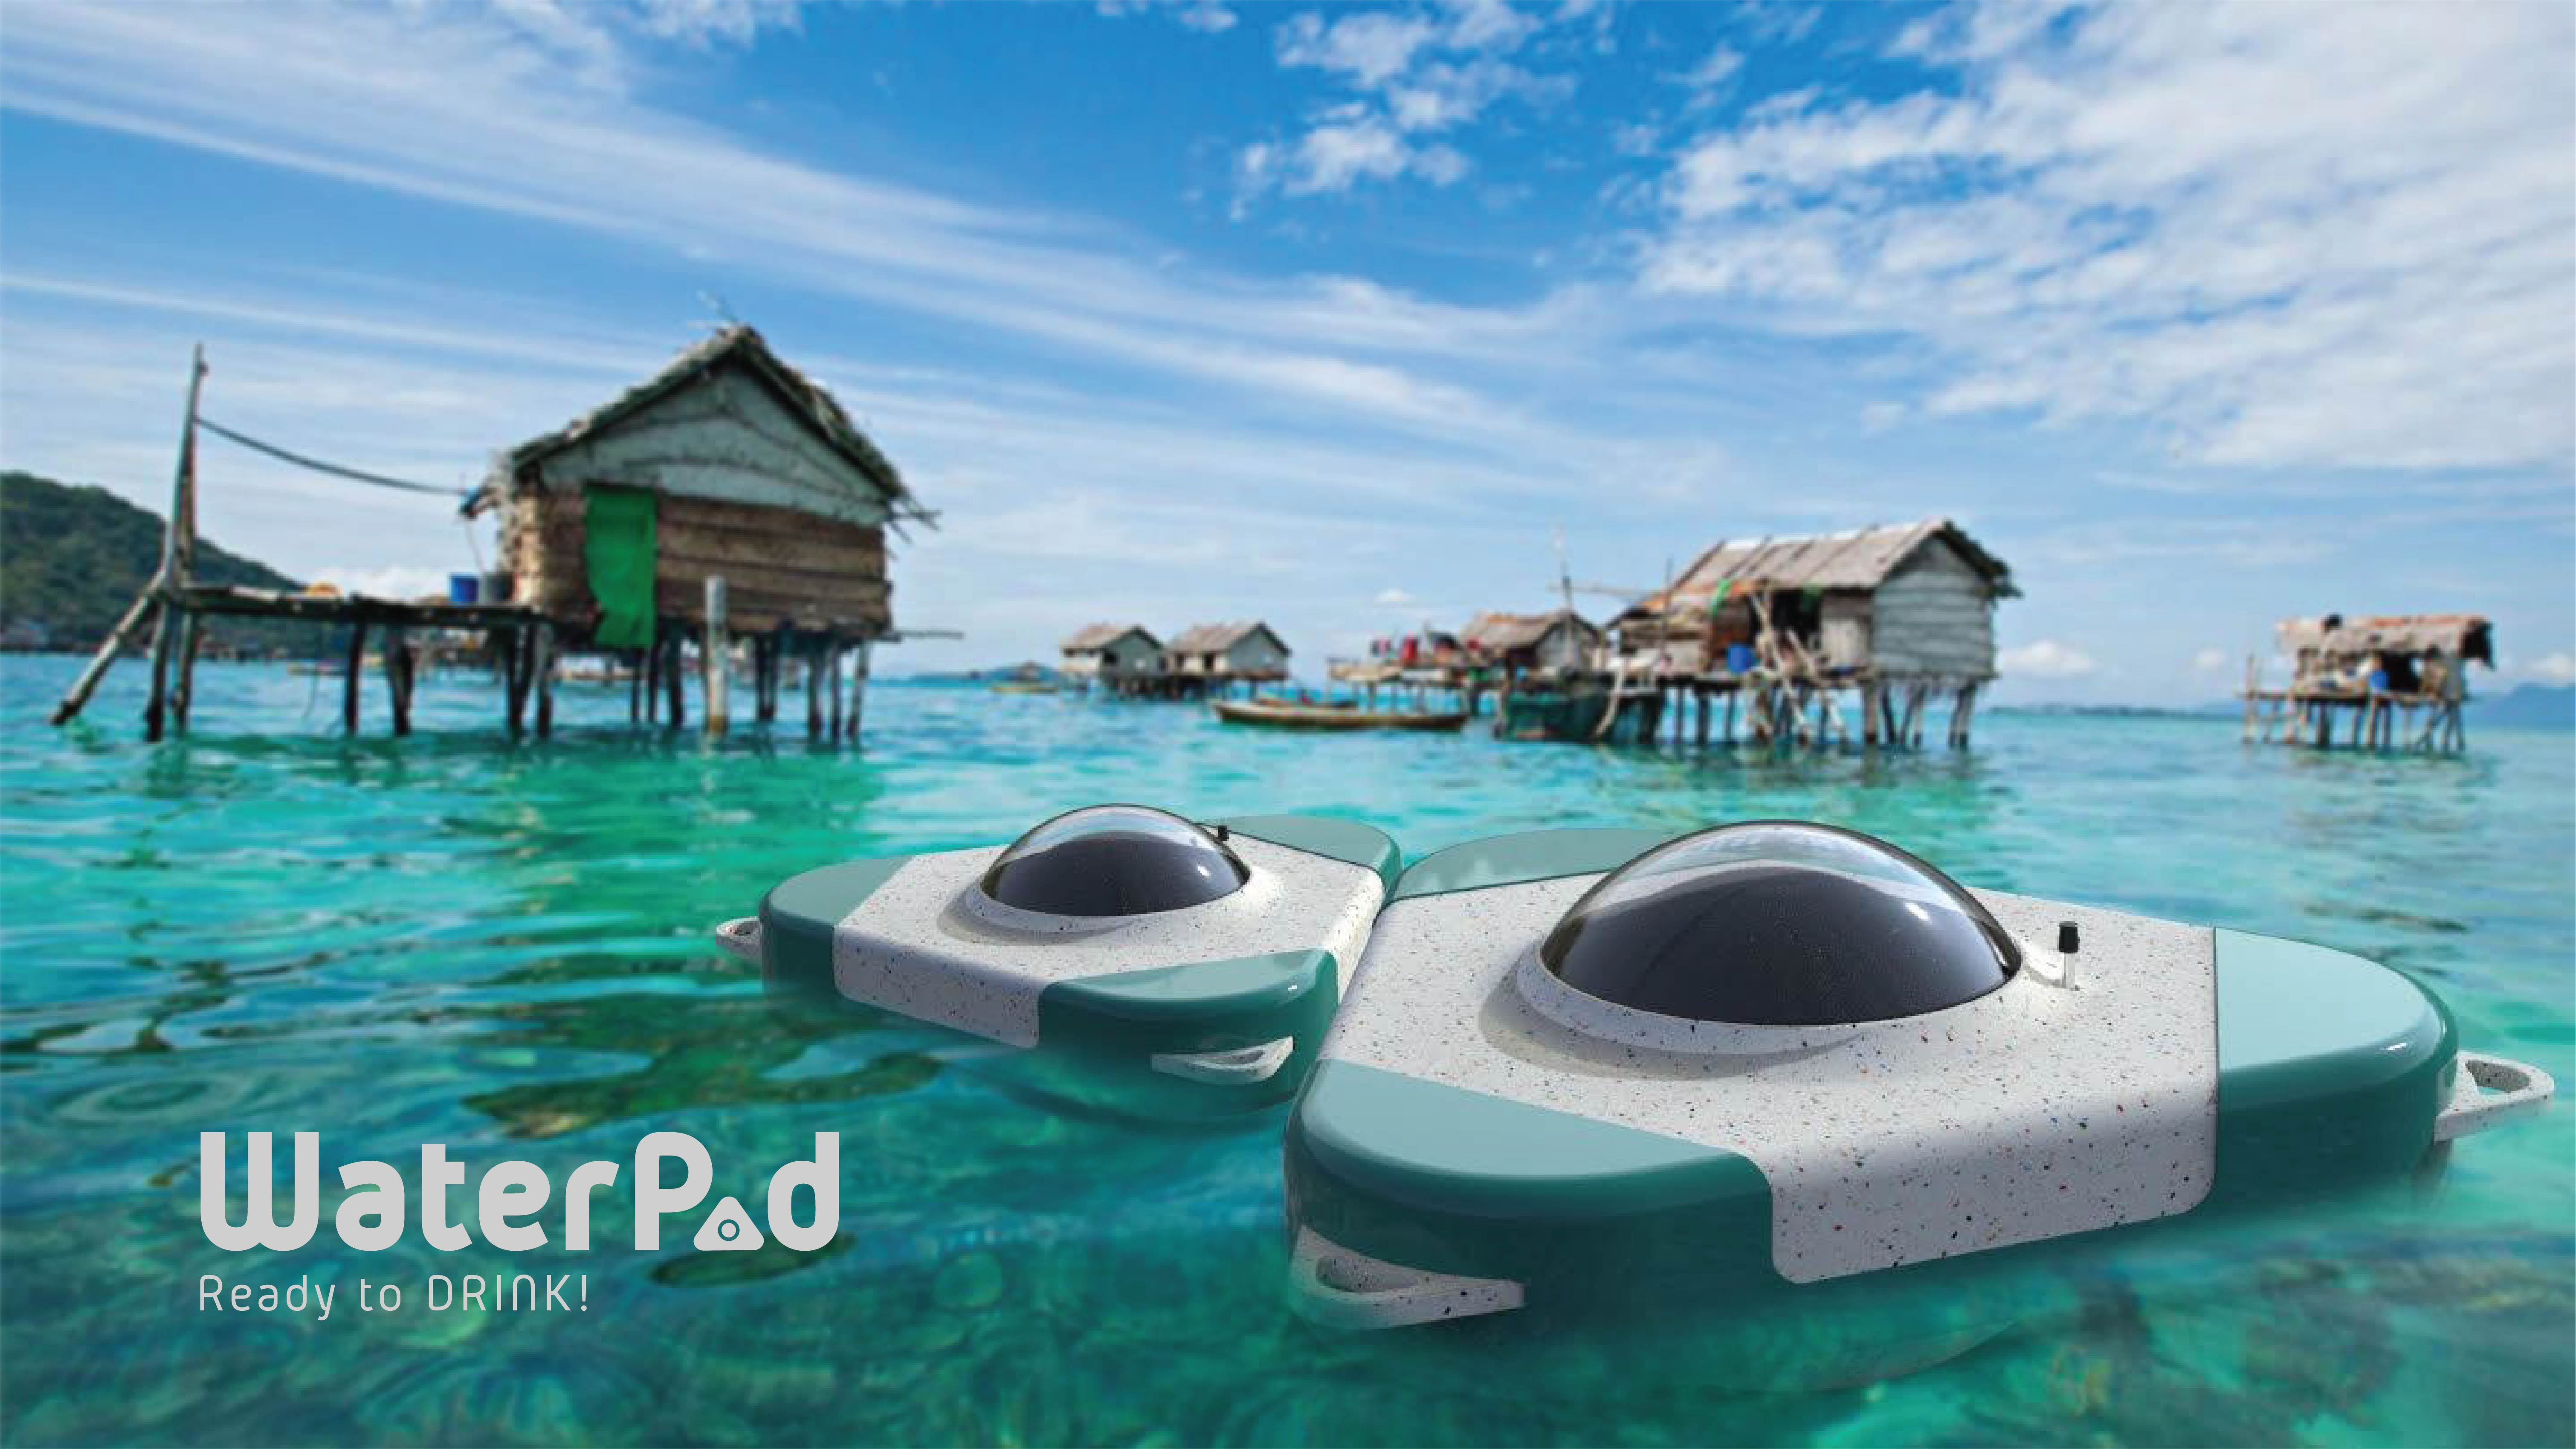 An image with a caption of: Product showcase in the sea nomads community deniz-suyu-icme-suyuna-cevrilebilir-mi